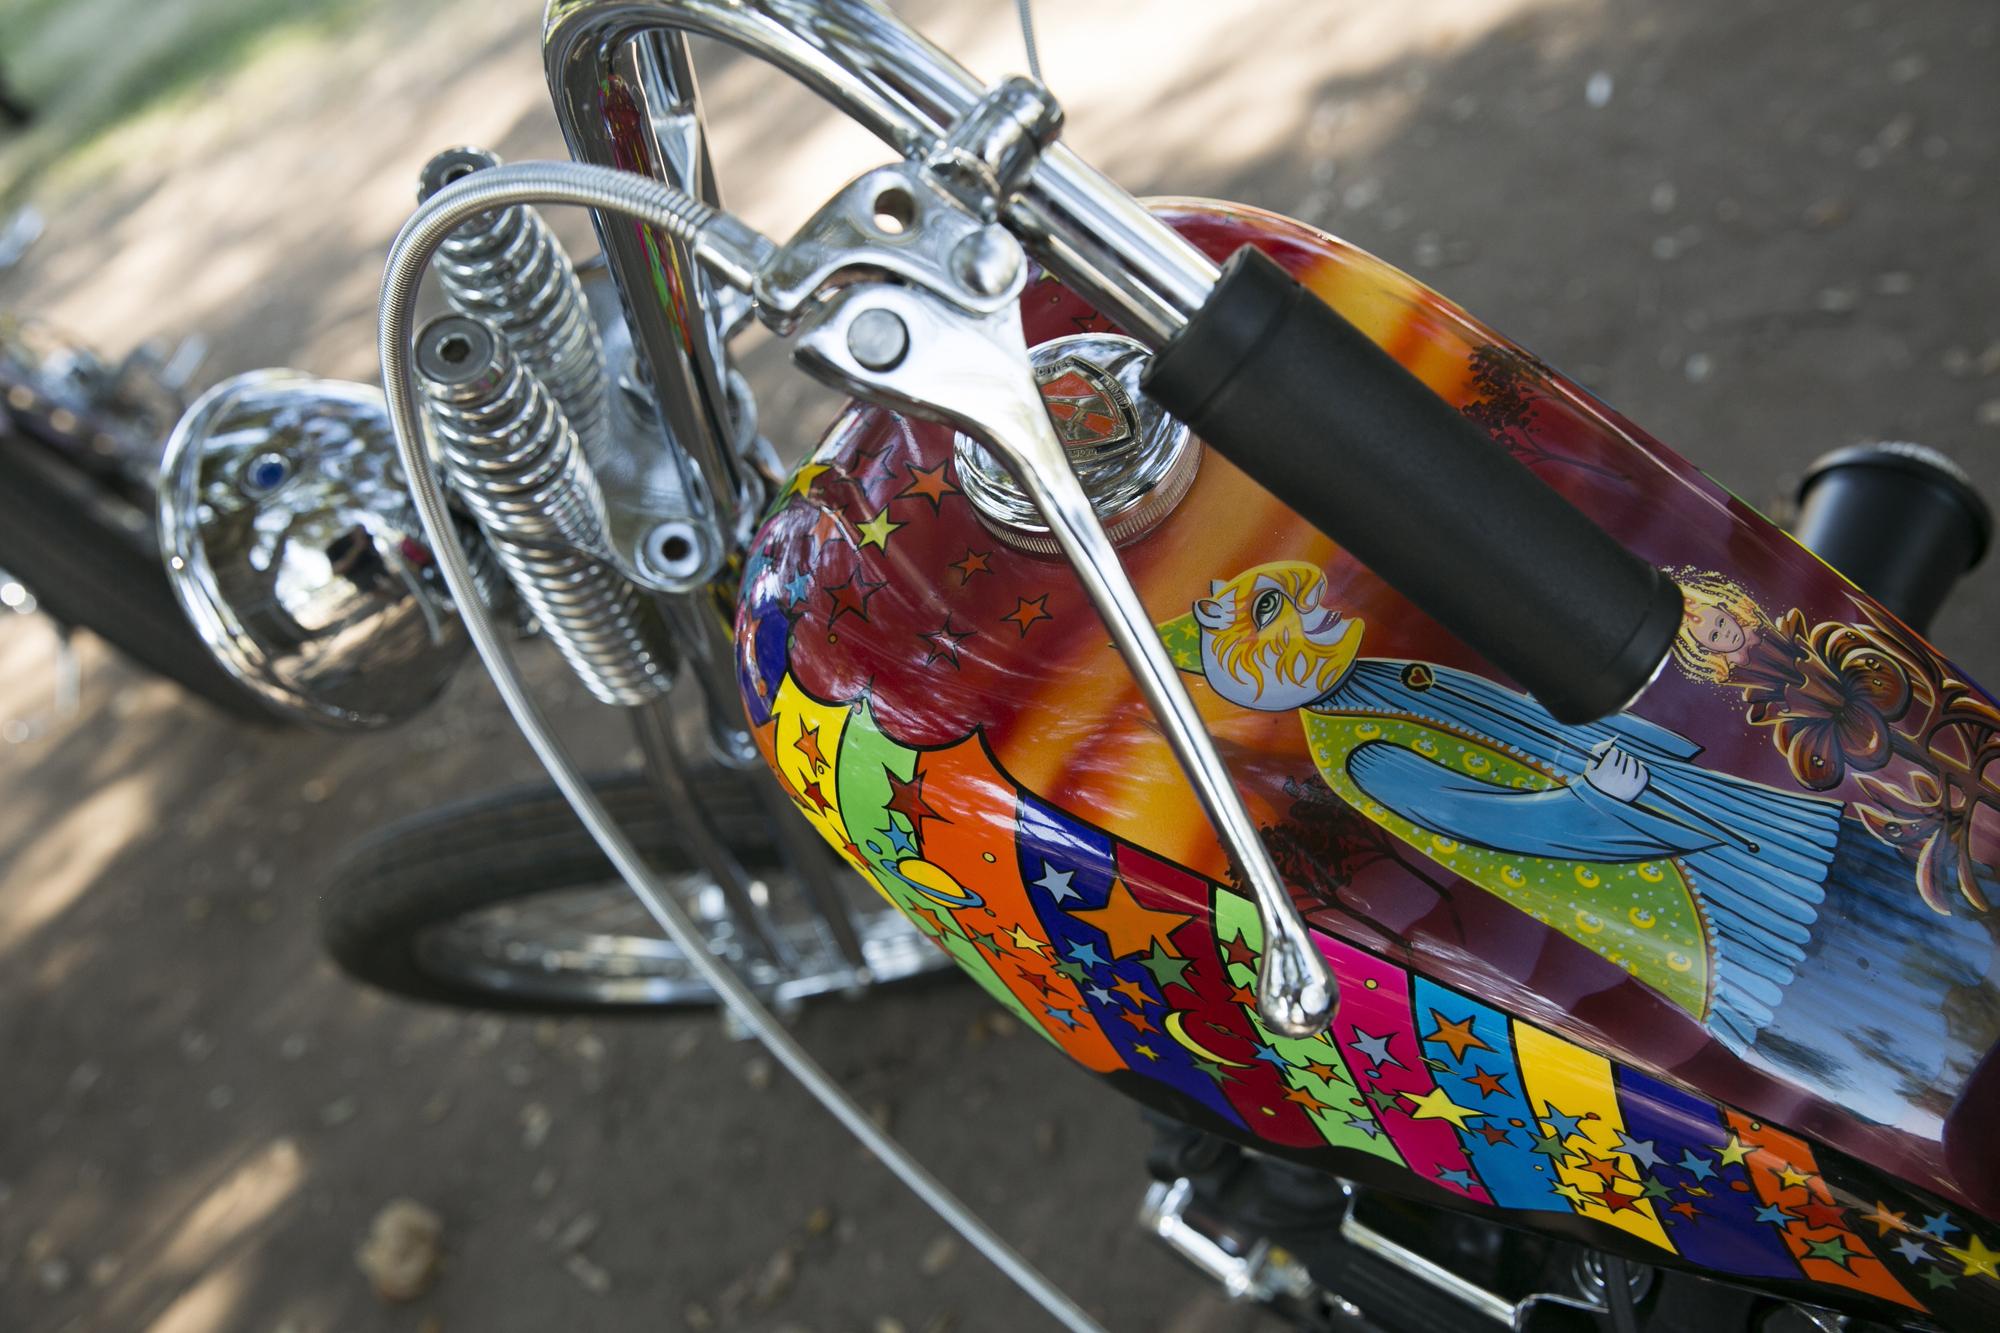 Born Free 8 Motorcycle Show-109.jpg